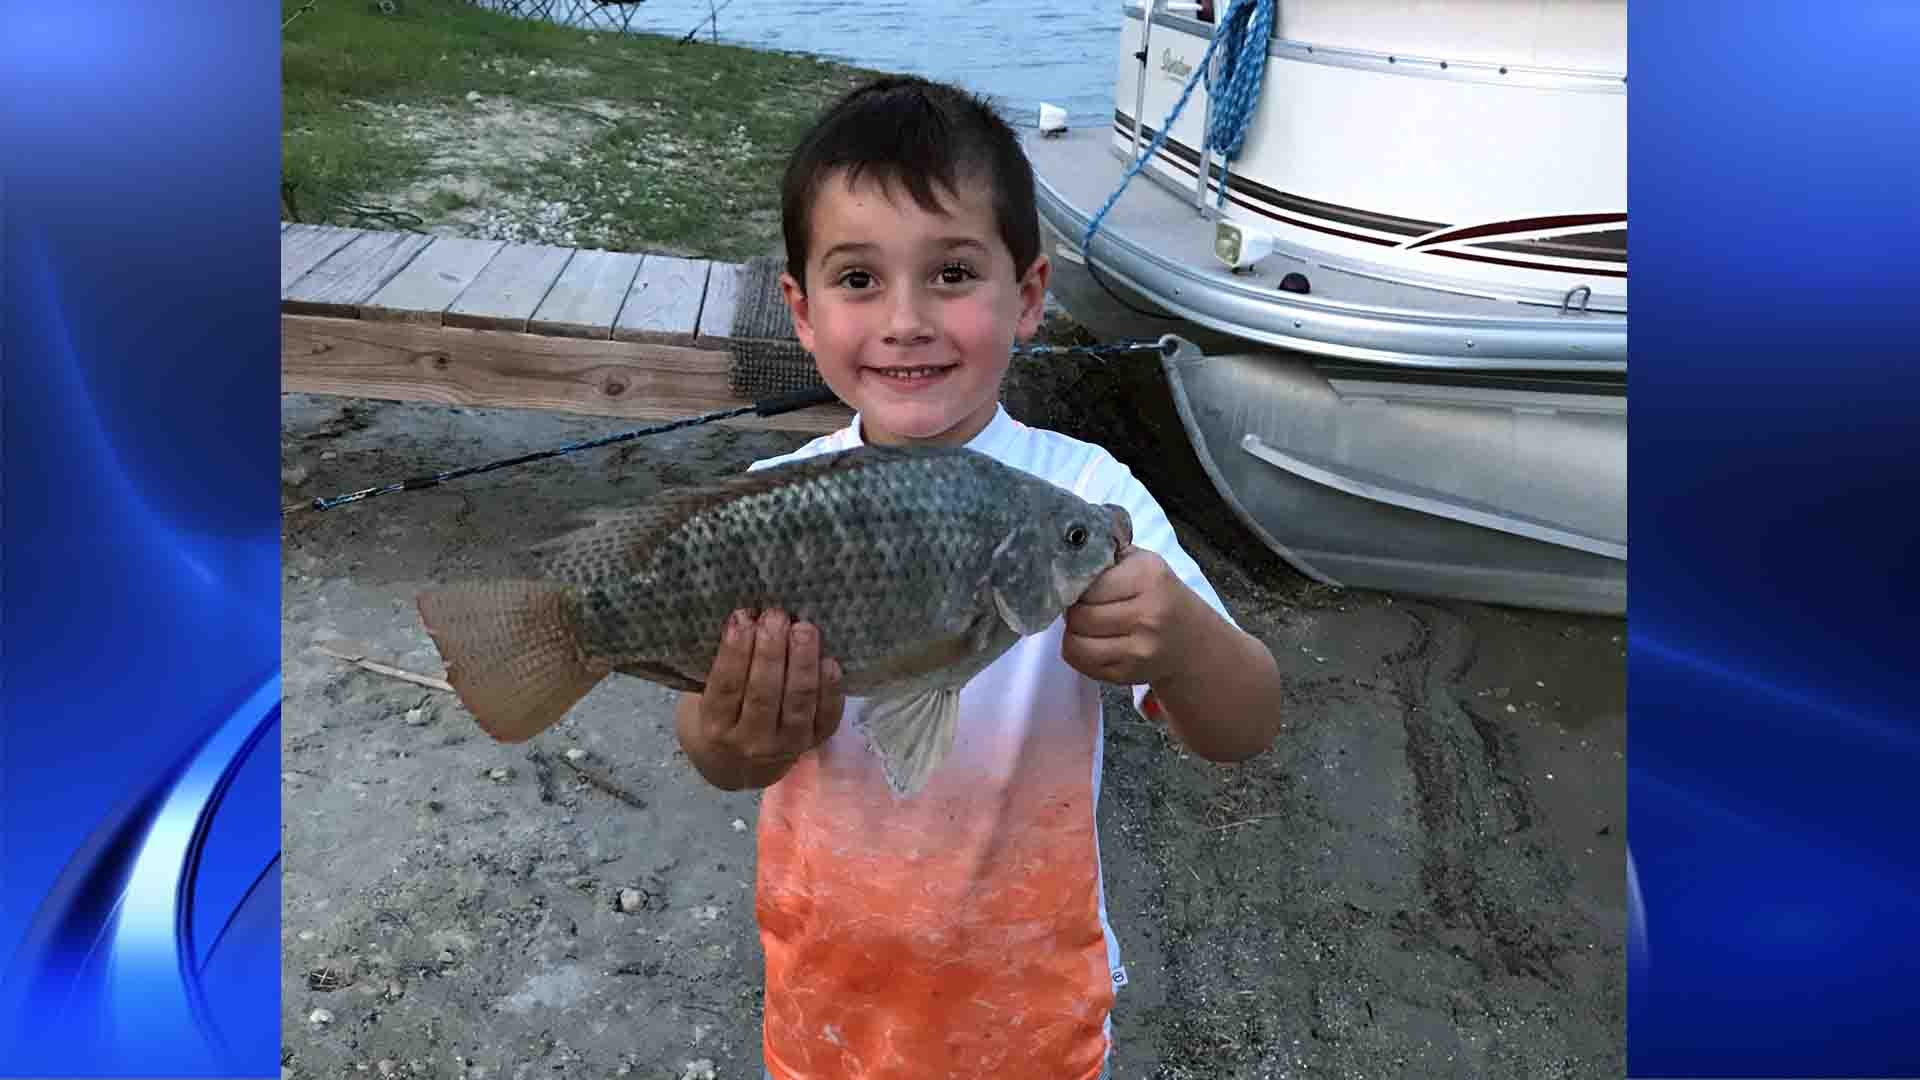 Jaxon Chadwick caught the record tilapia at Lake Corpus Christi Wednesday night.